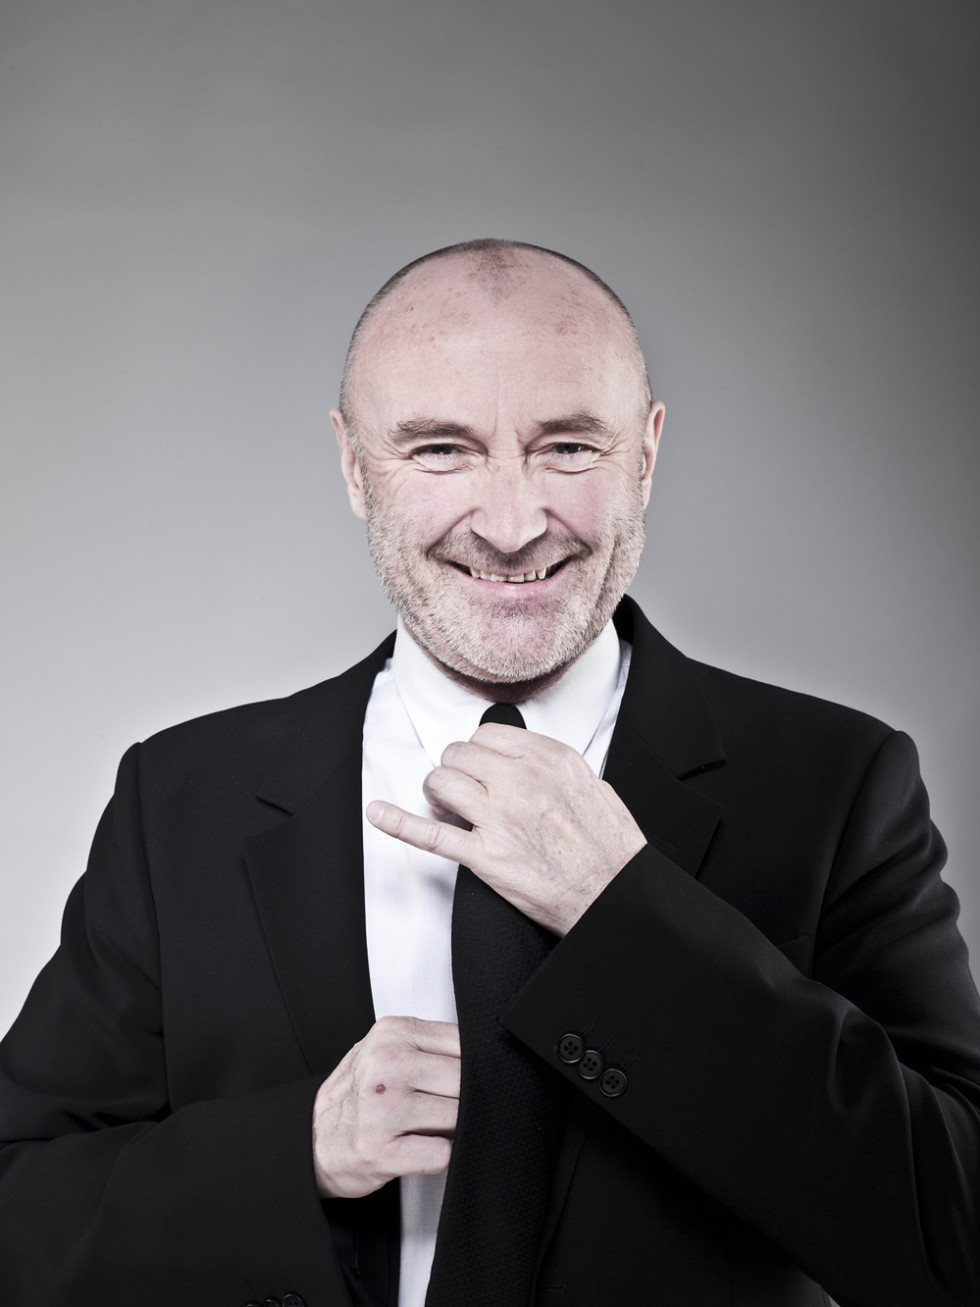 Phil Collins headshot